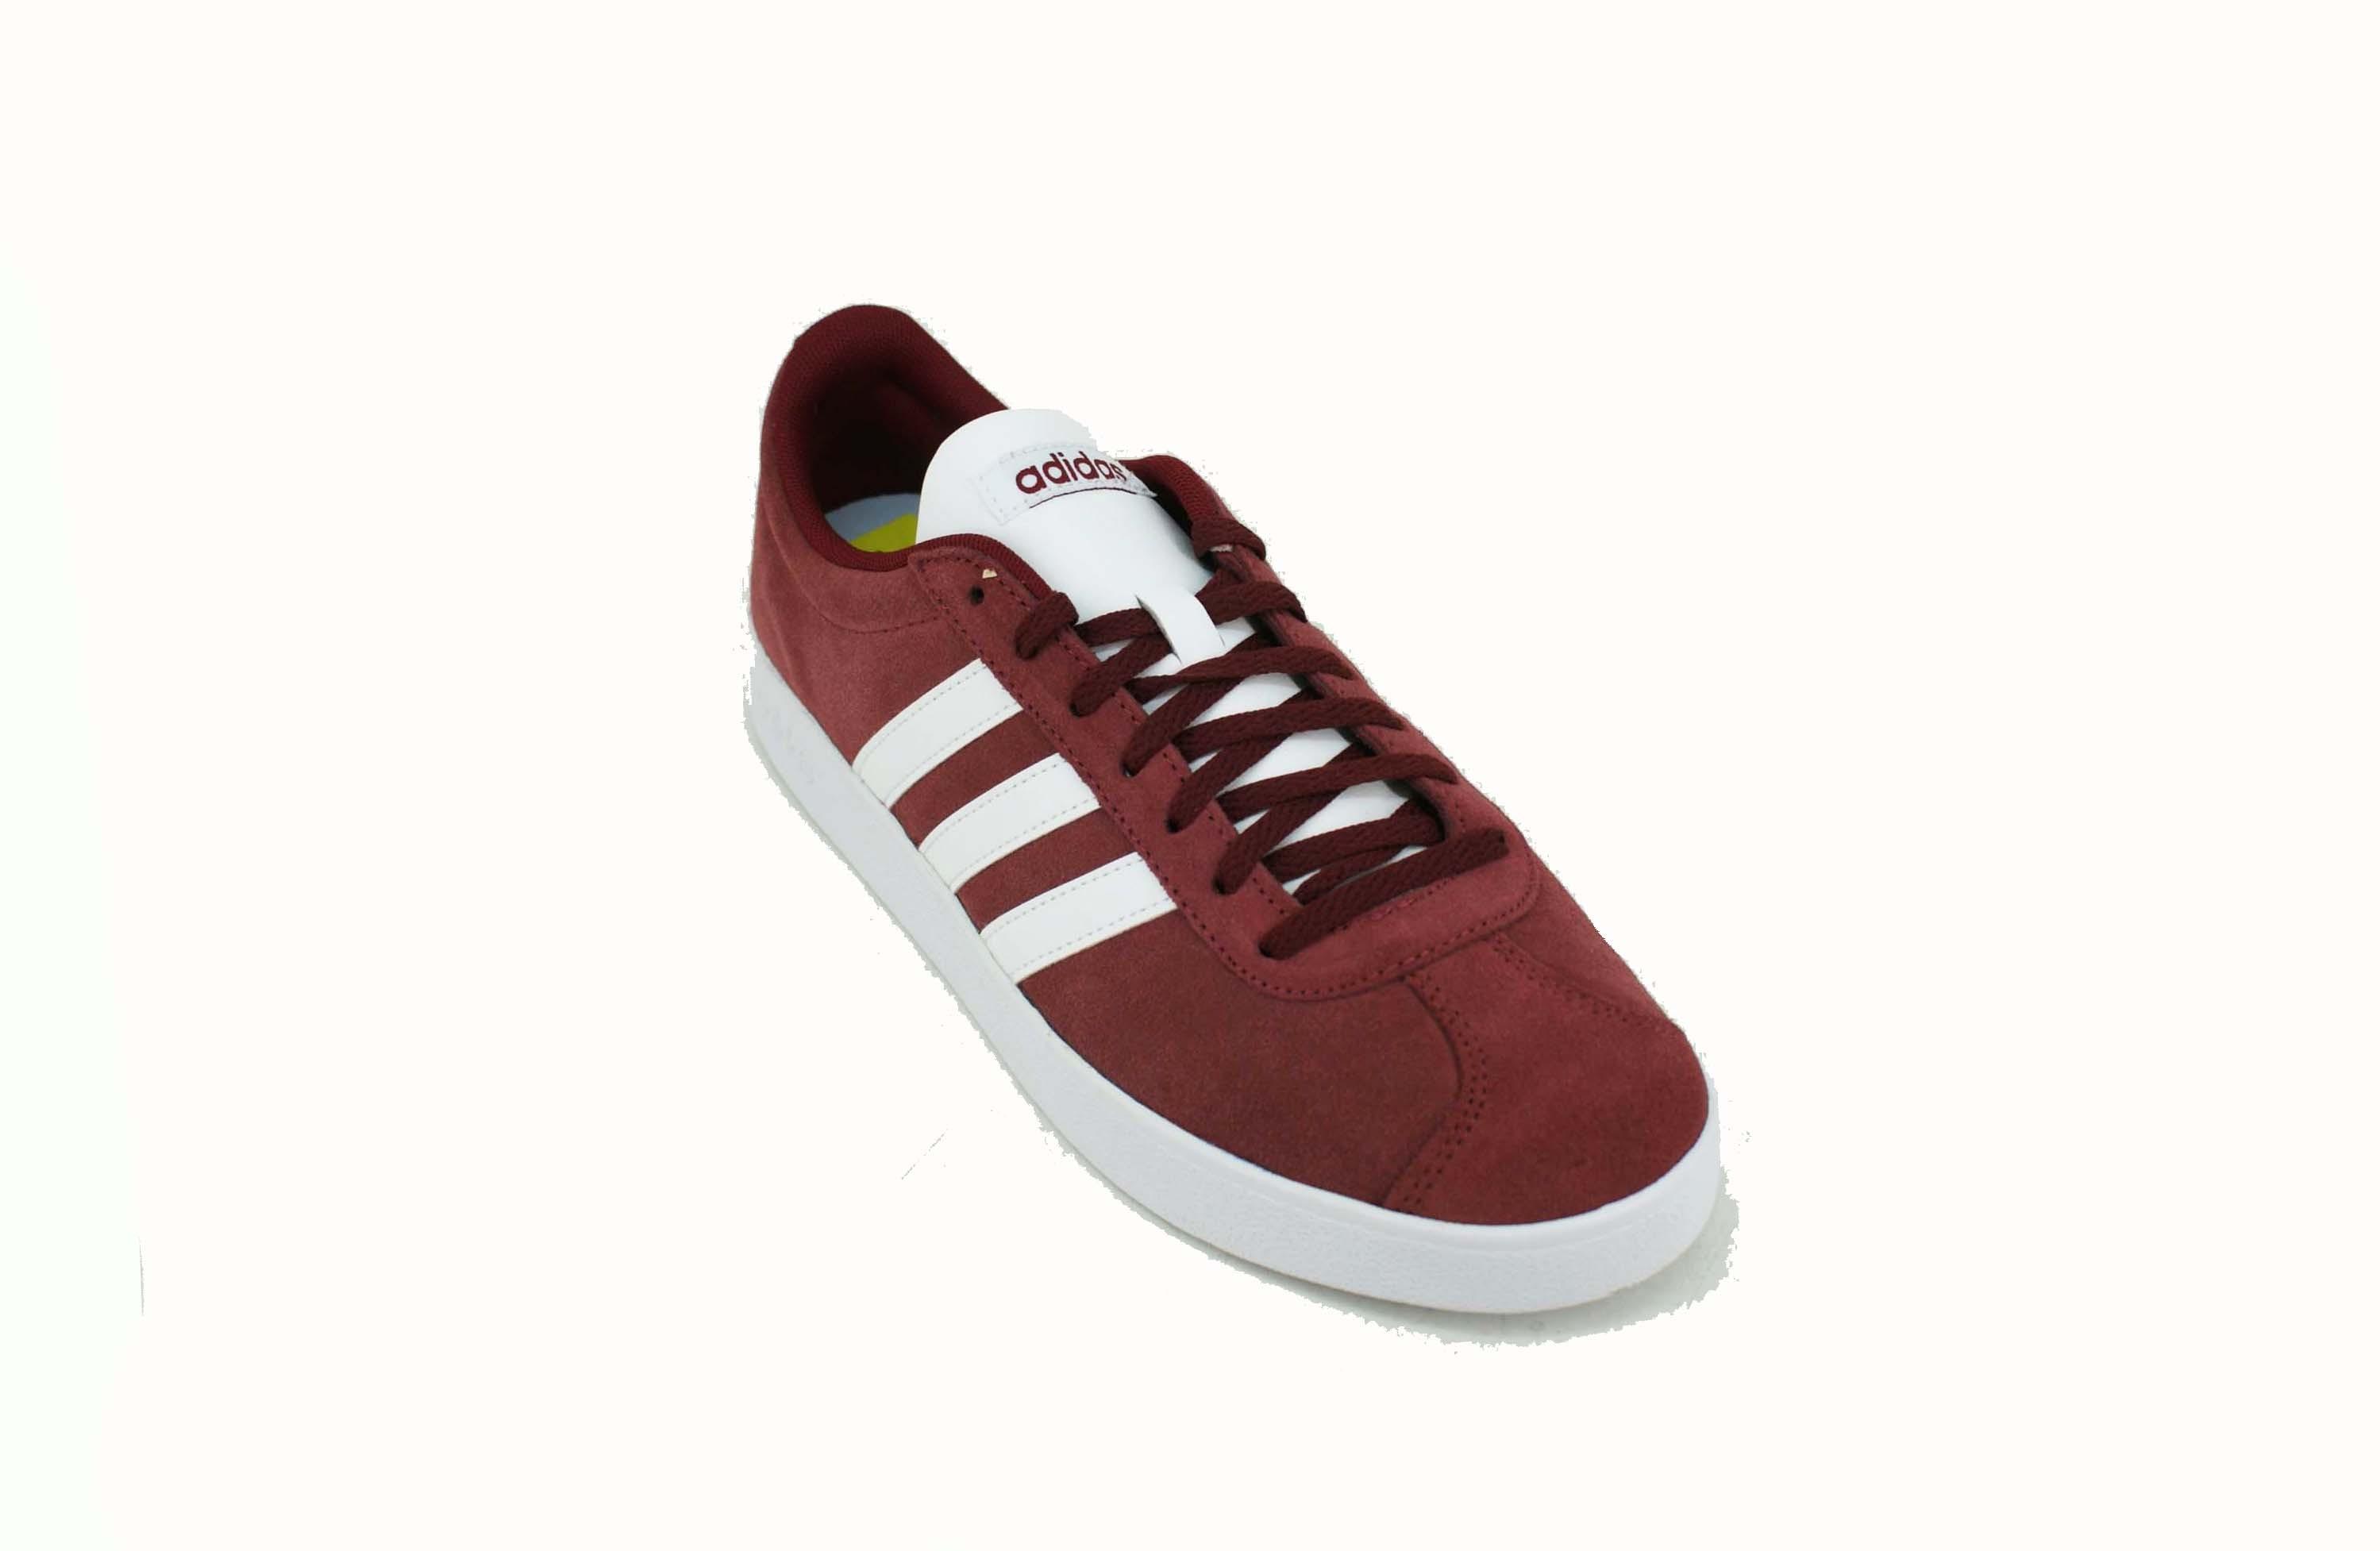 ac165a695 Zapatilla Adidas VL Court 2.0 Bordo/Blanco Hombre Deporfan ...